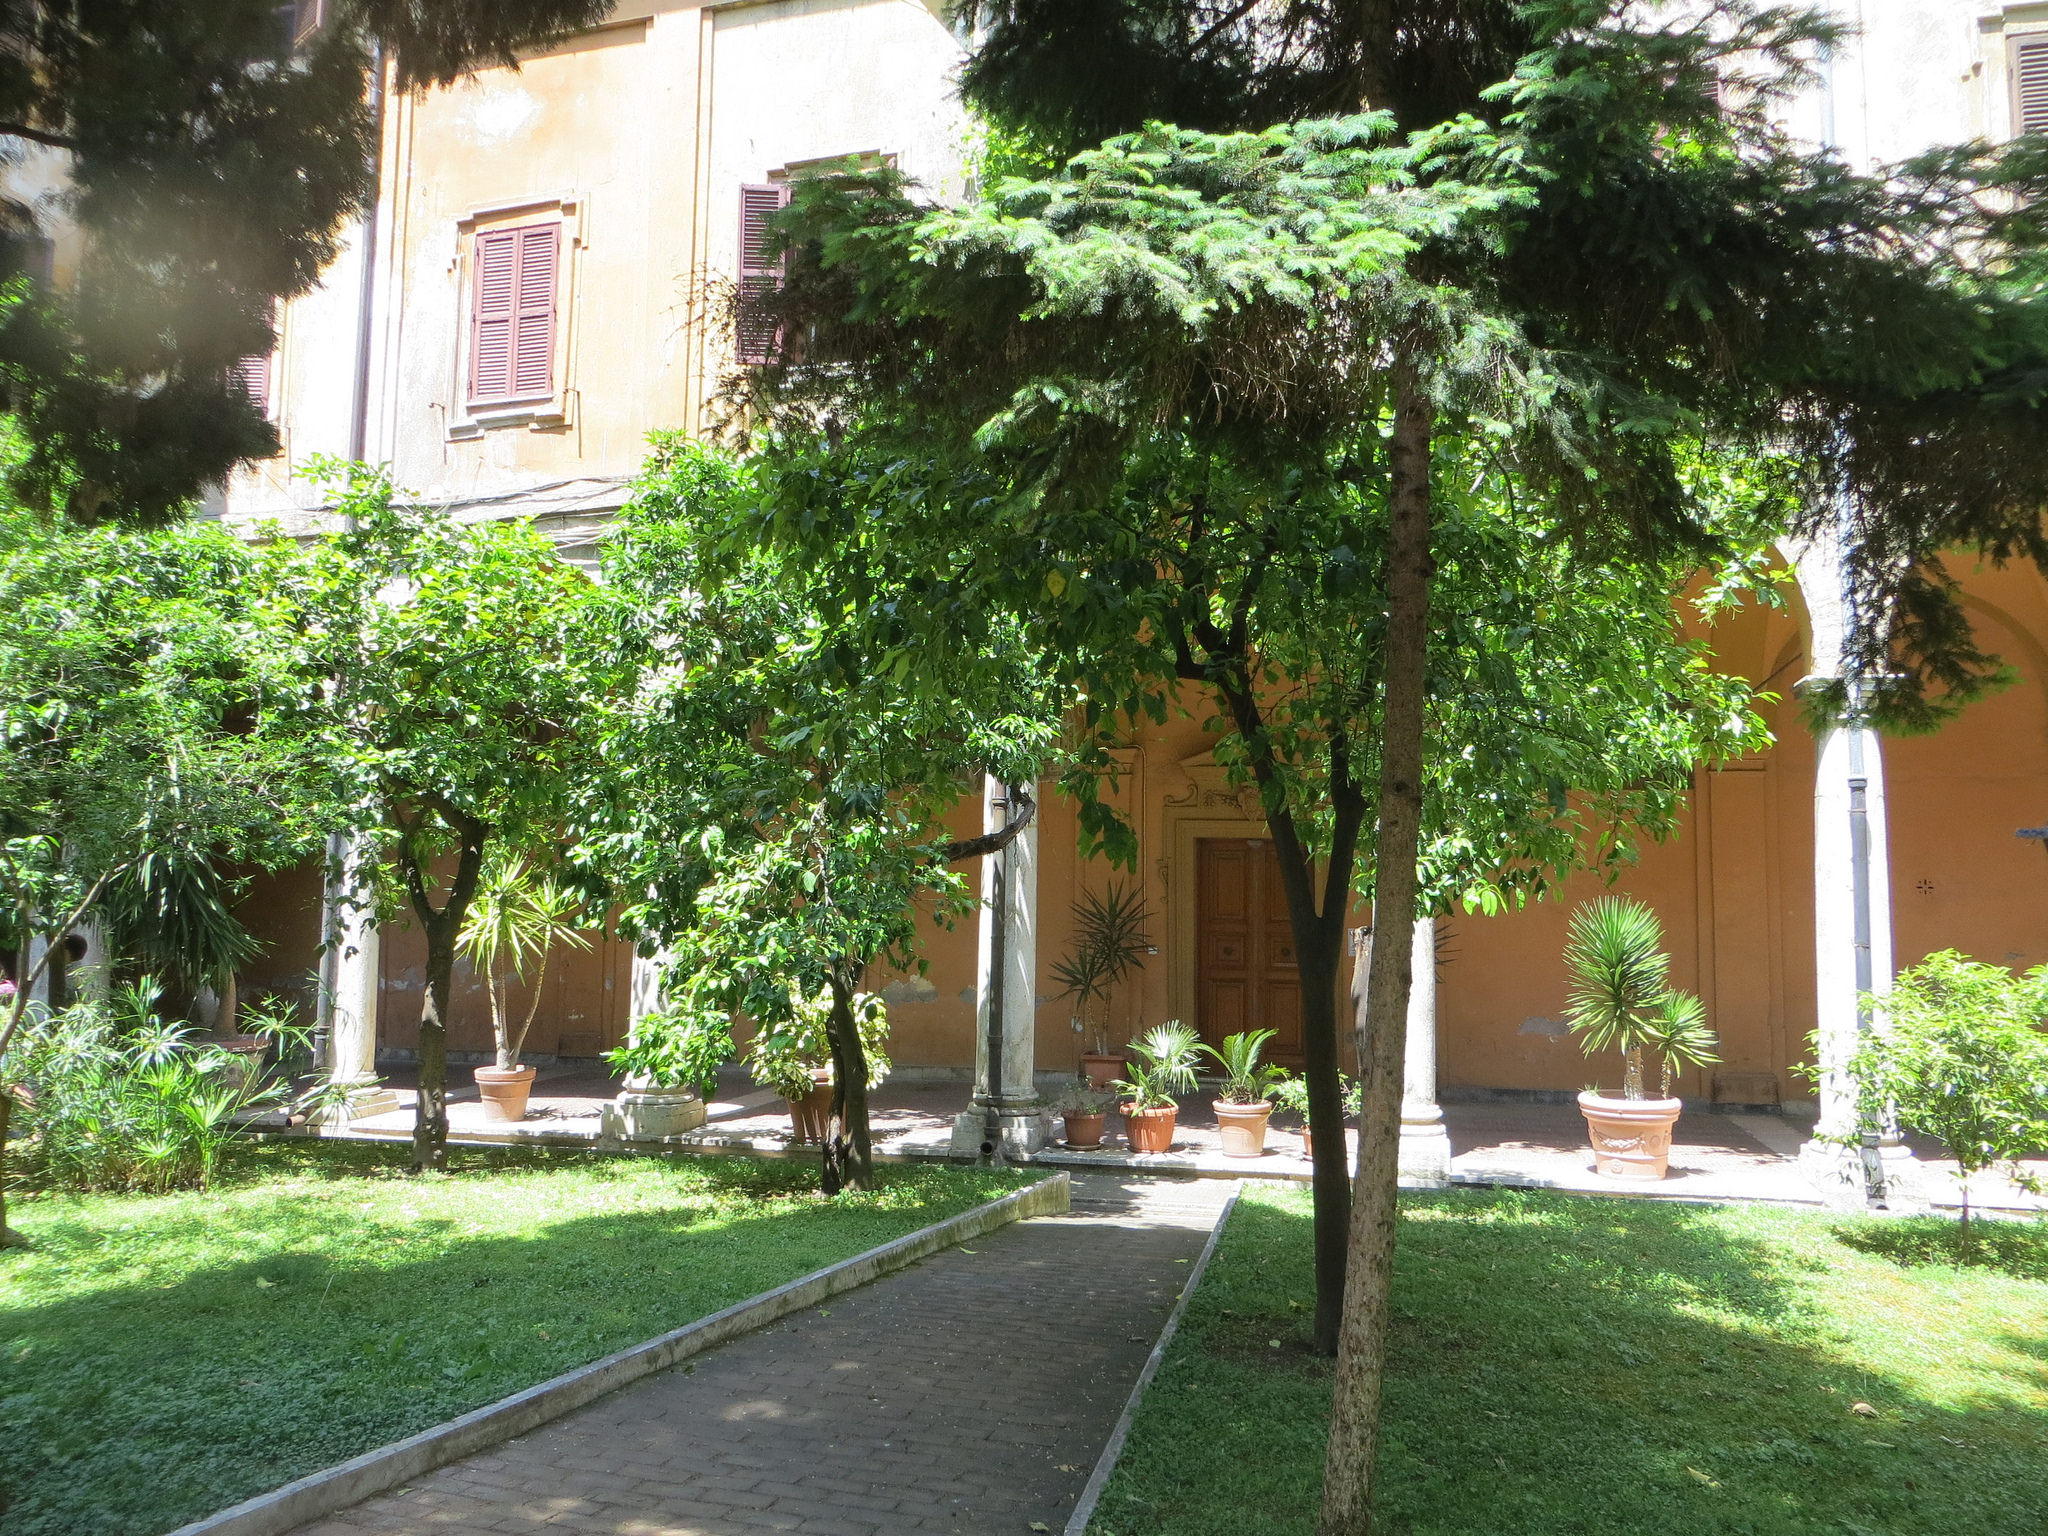 Konserwatorium Santa Cecilia, fot. alljengi/Flickr